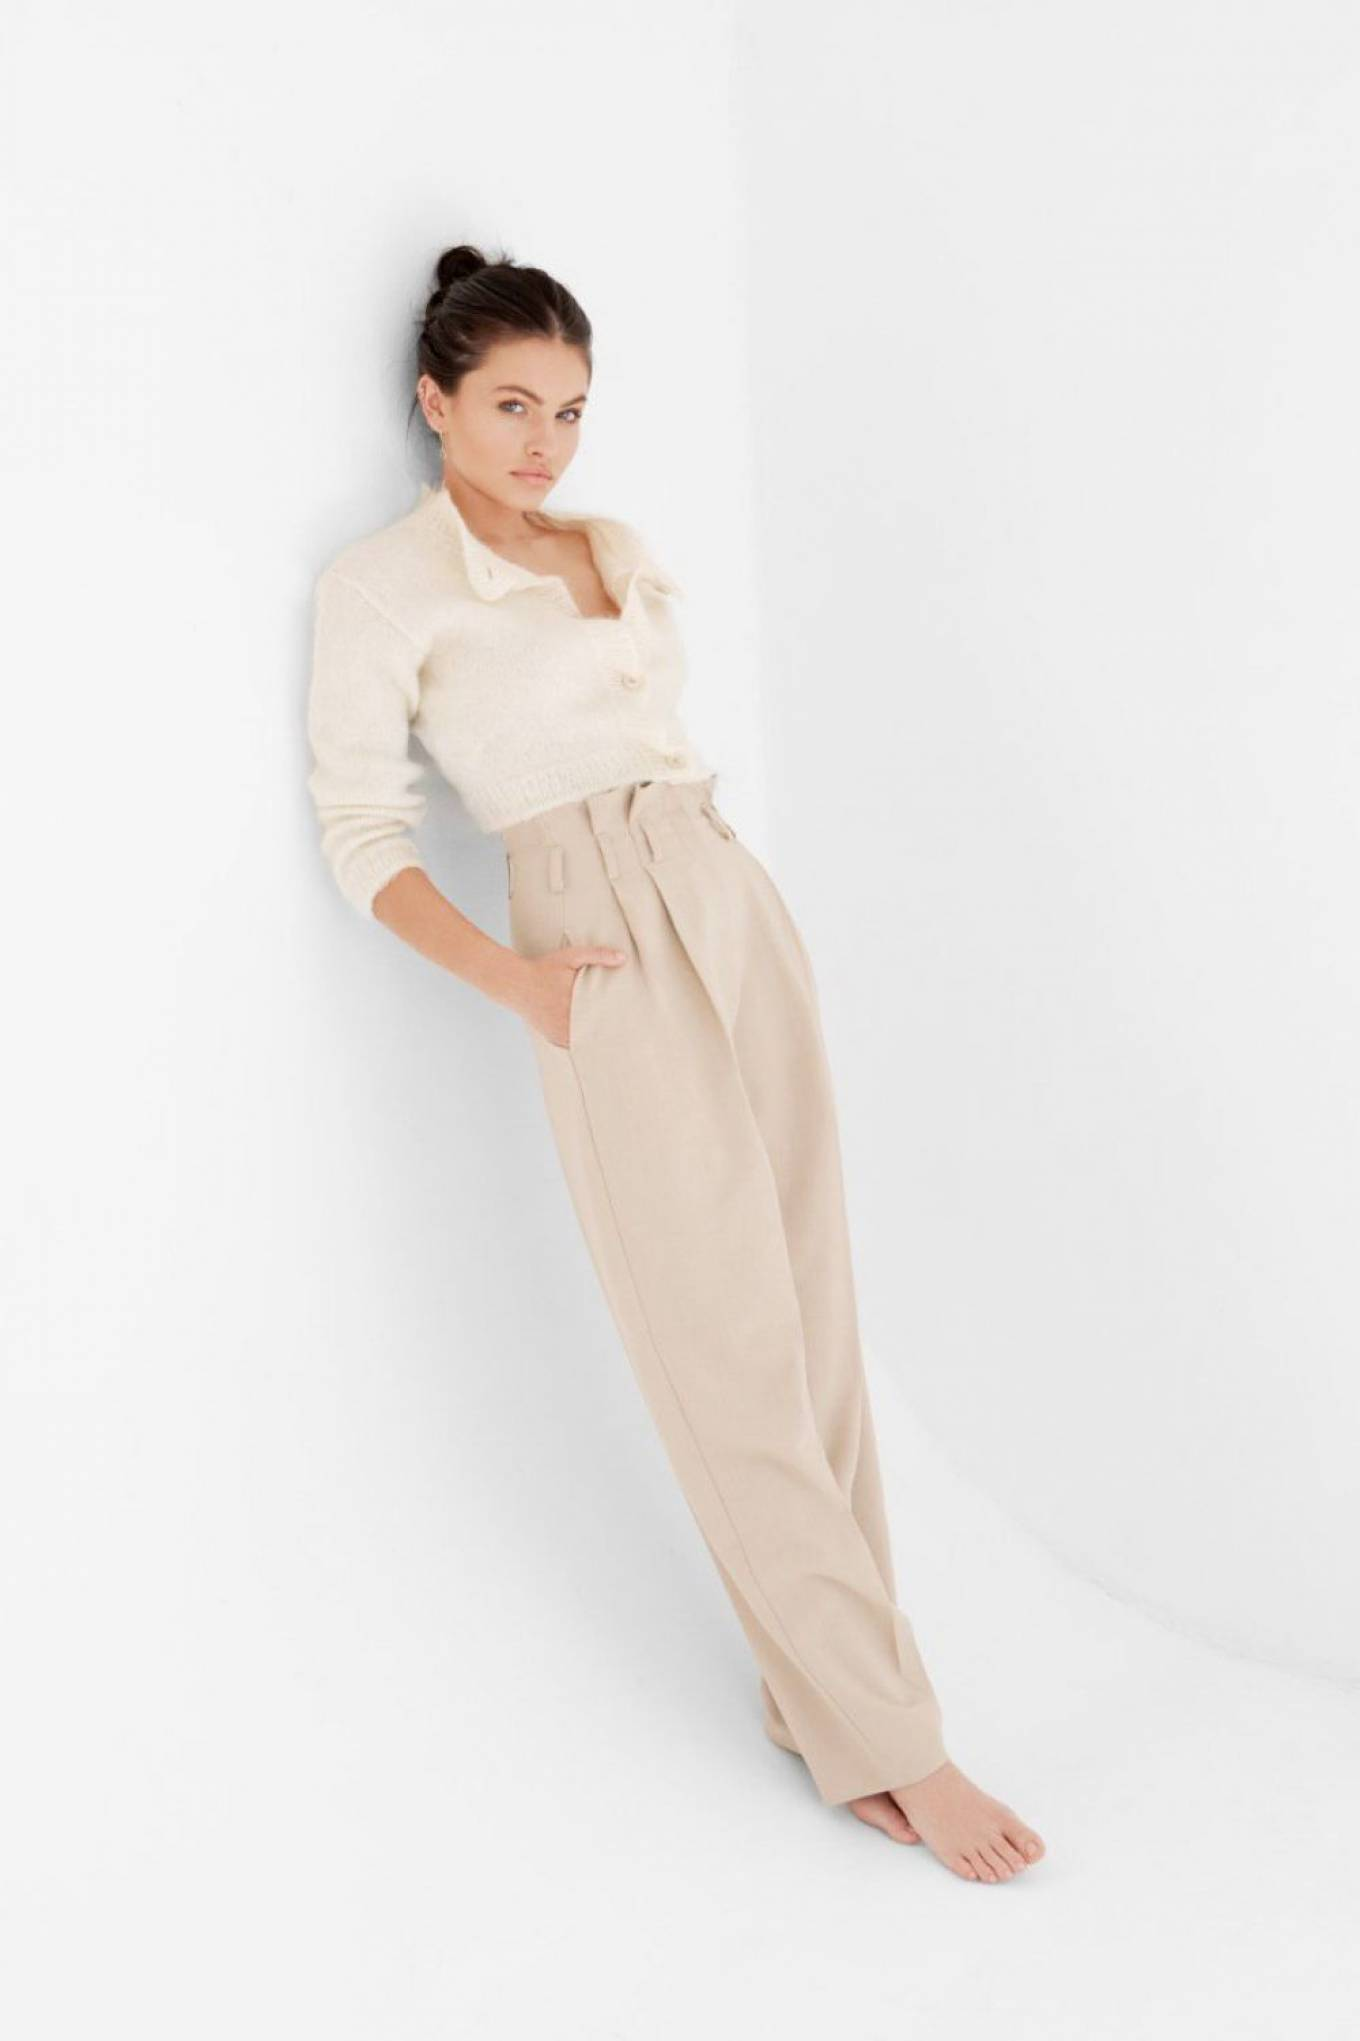 Thylane Blondeau 2020 : Thylane Blondeau – Harper's Bazaar Magazine (Kazakhstan – July 2020)-09